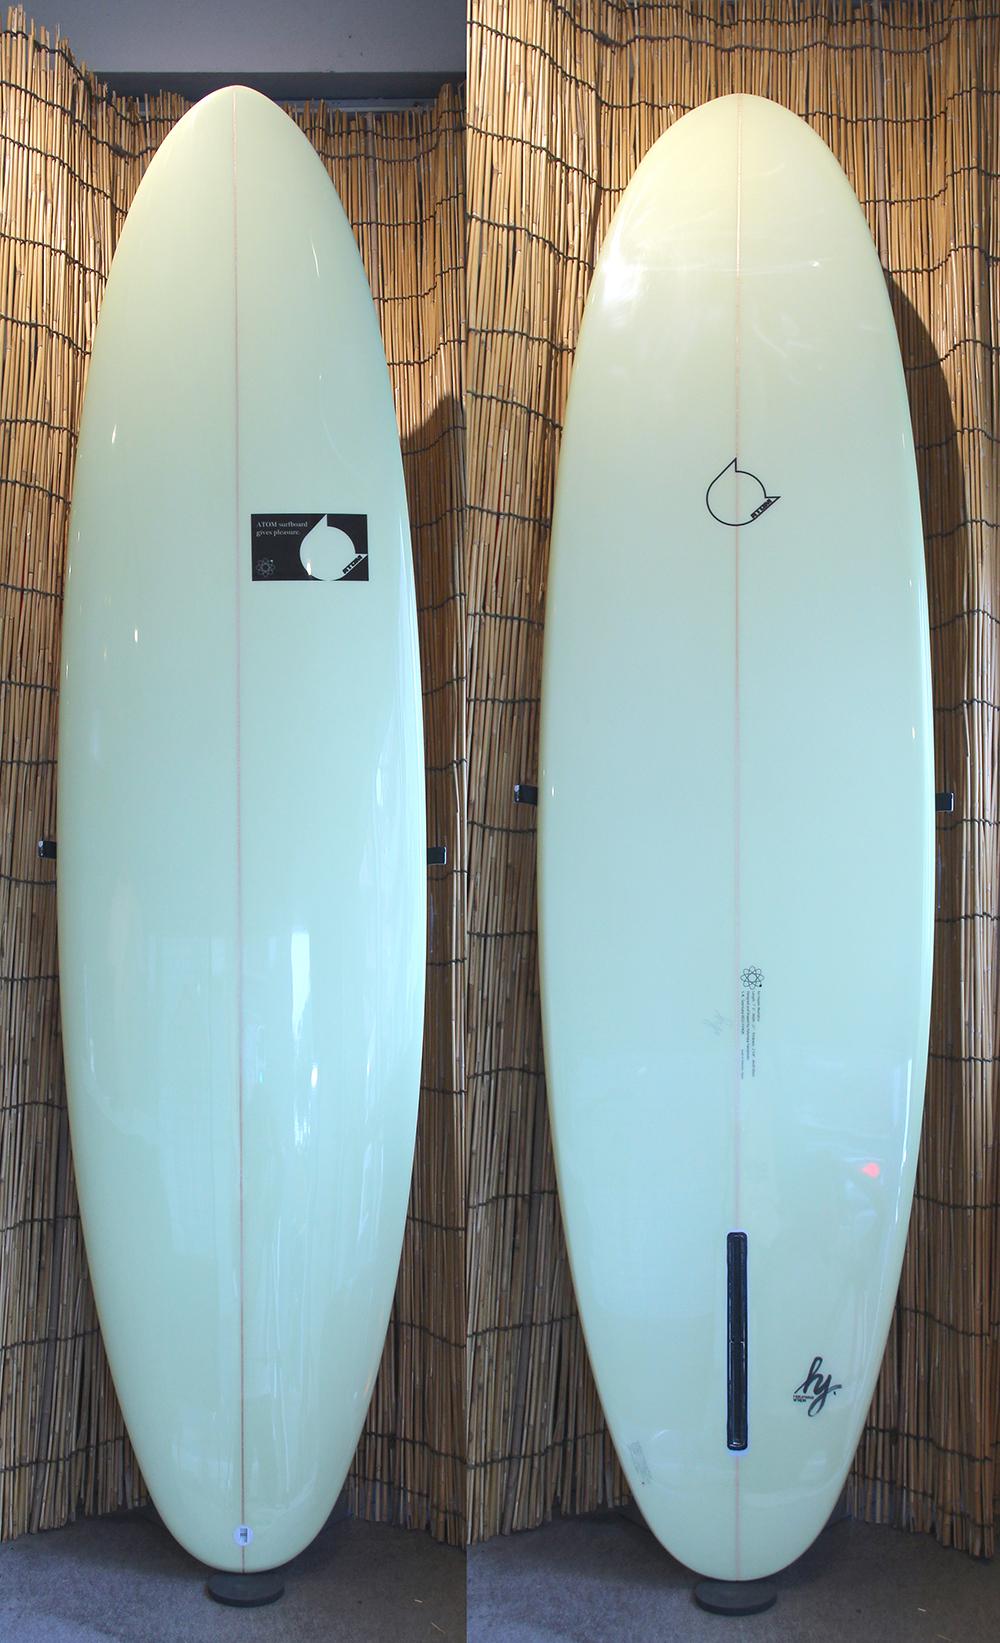 ATOM Surfboard Sanctuary model